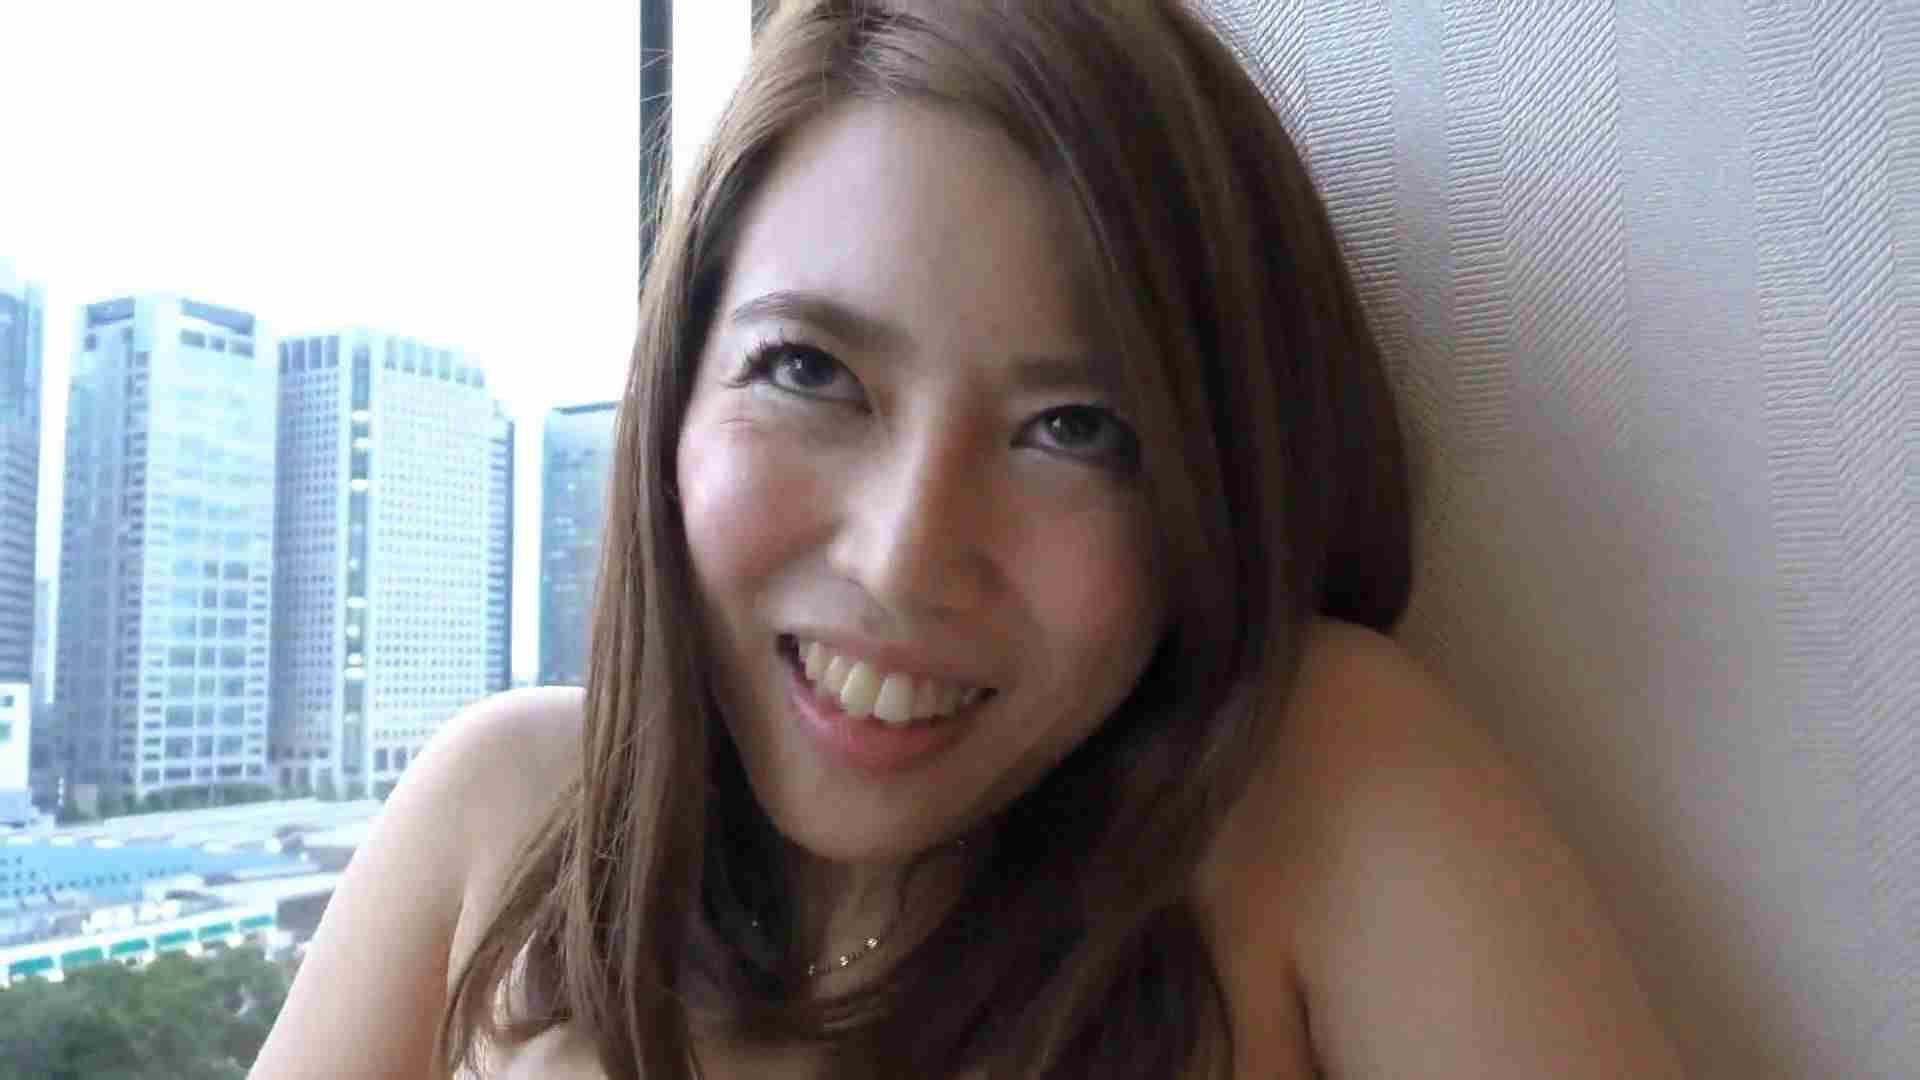 S級厳選美女ビッチガールVol.21 OLヌード天国 | モデルのエッチ  60PIX 16